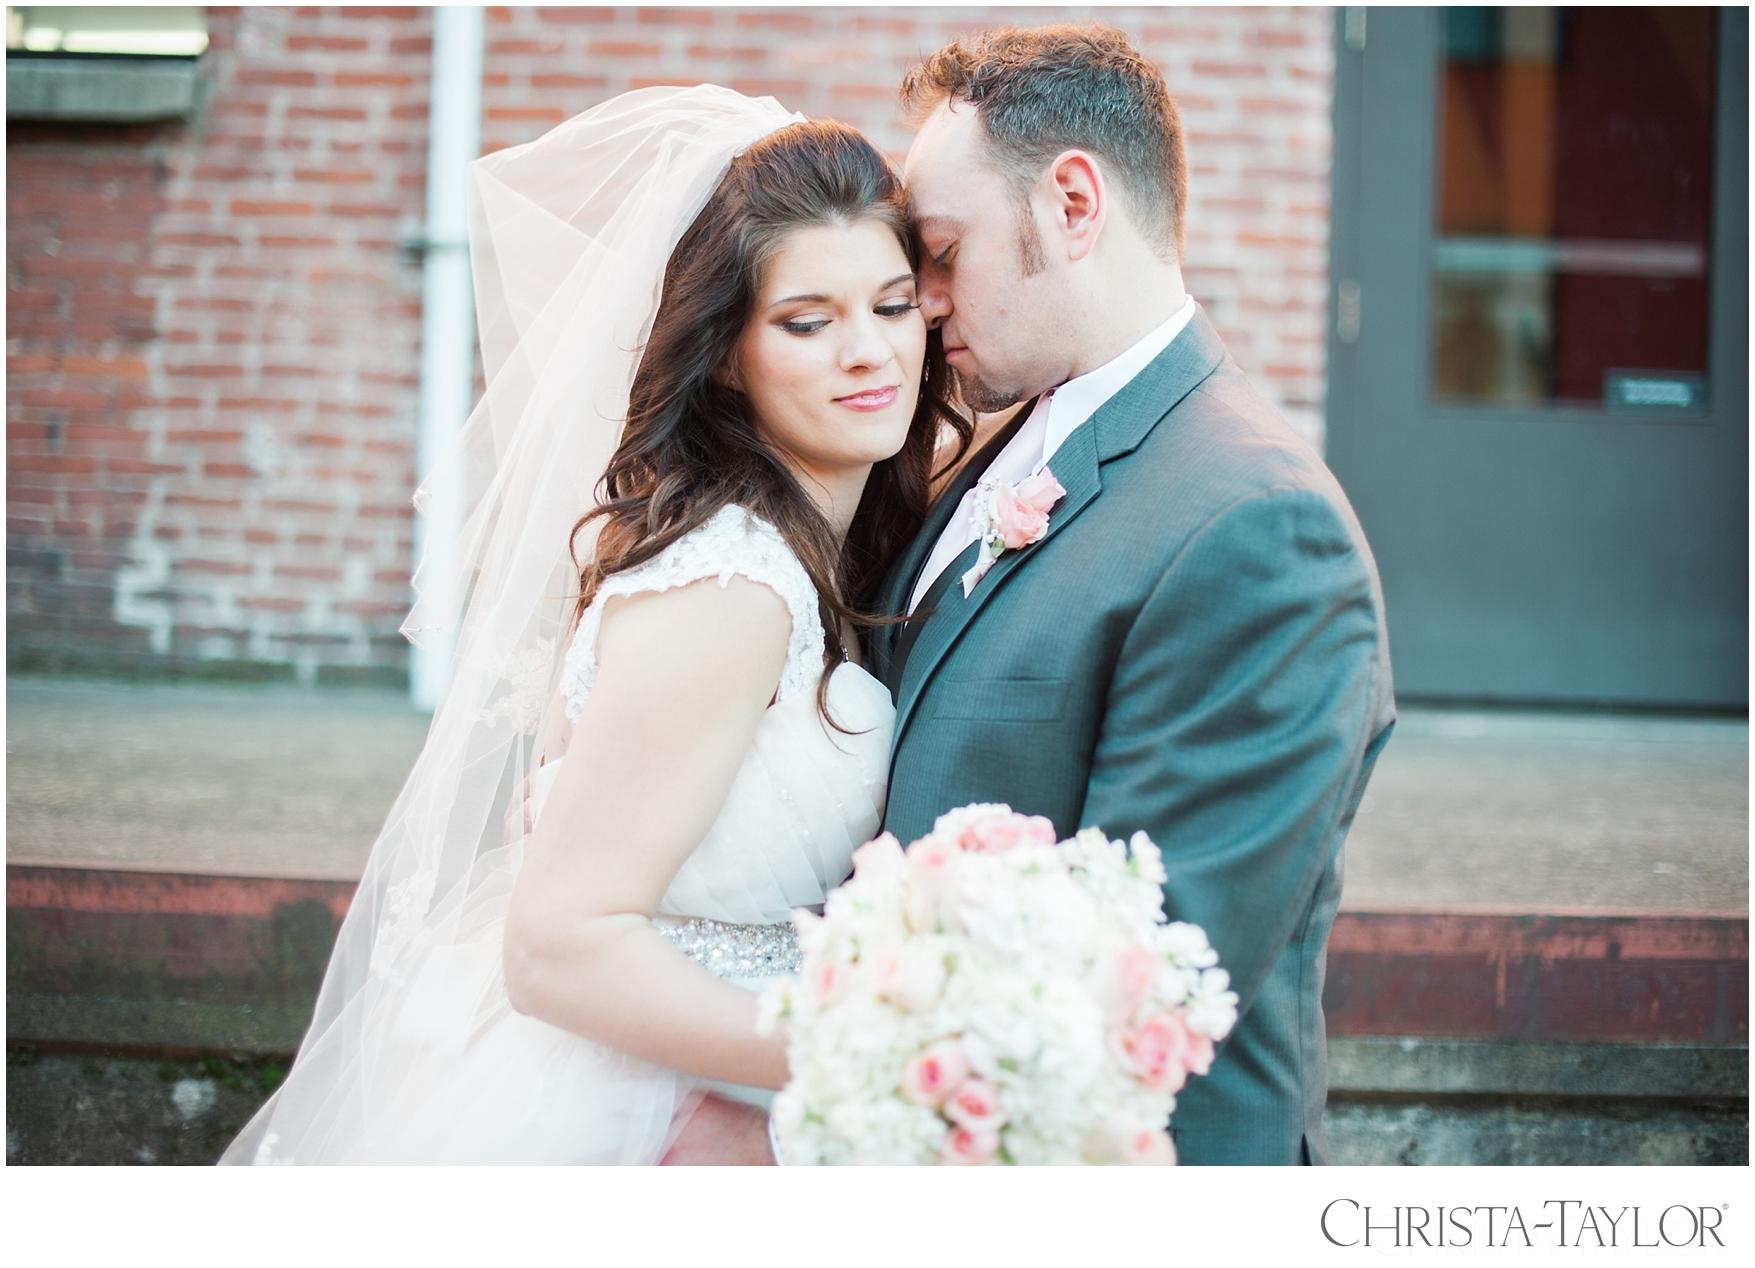 castaway portland wedding christa taylor_2265.jpg